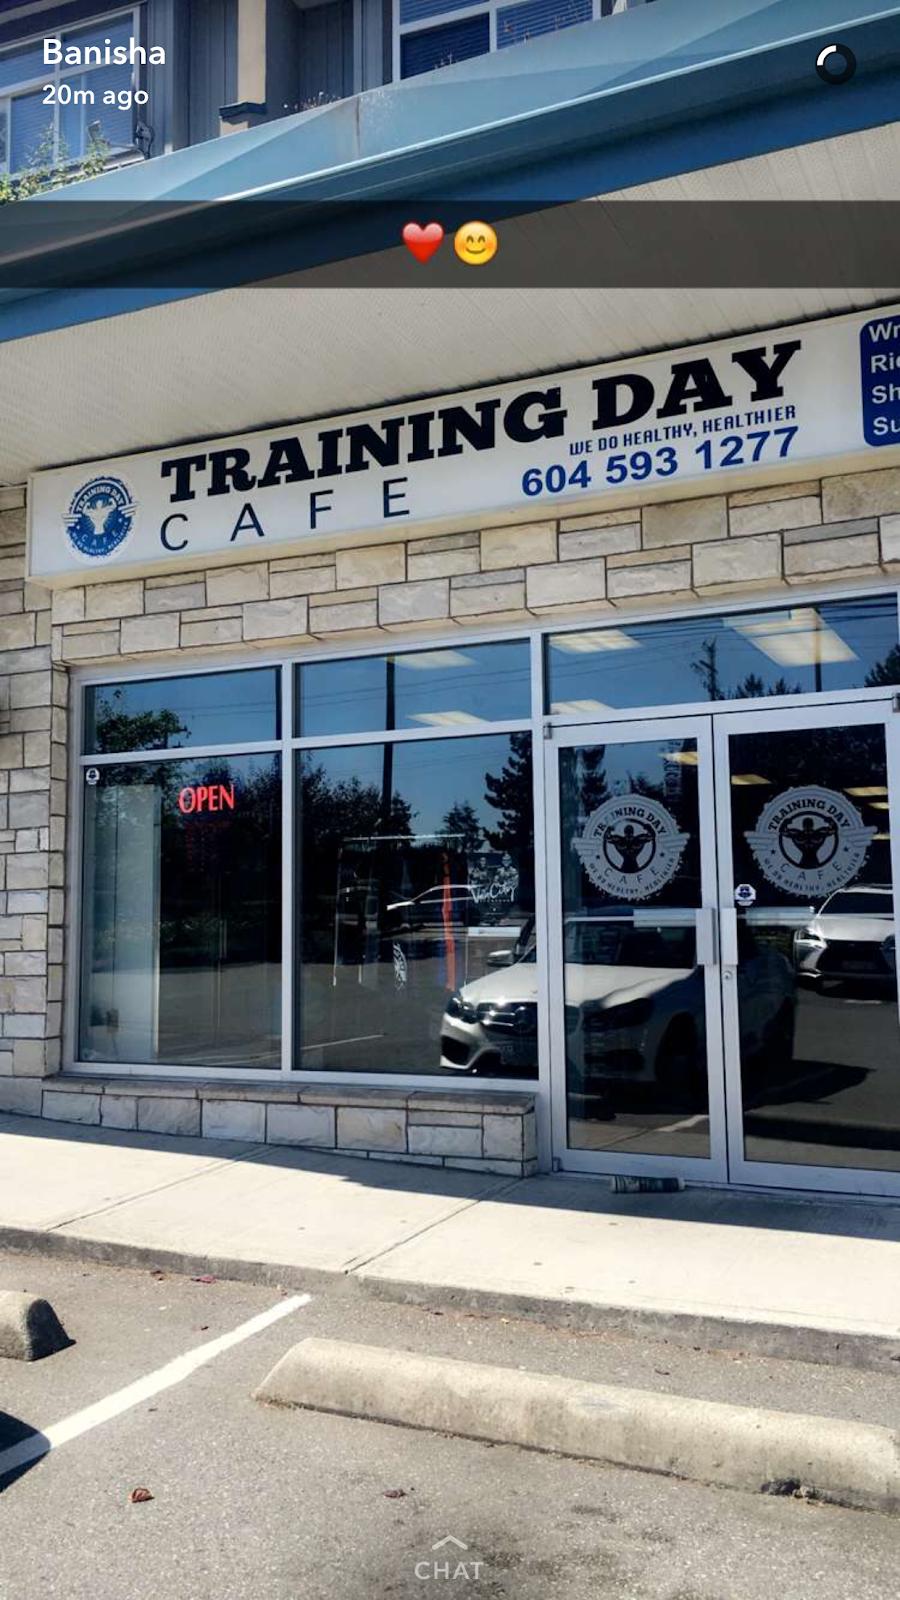 Training Day Cafe   cafe   8077 King George Blvd, Surrey, BC V3W 5B4, Canada   6045931277 OR +1 604-593-1277